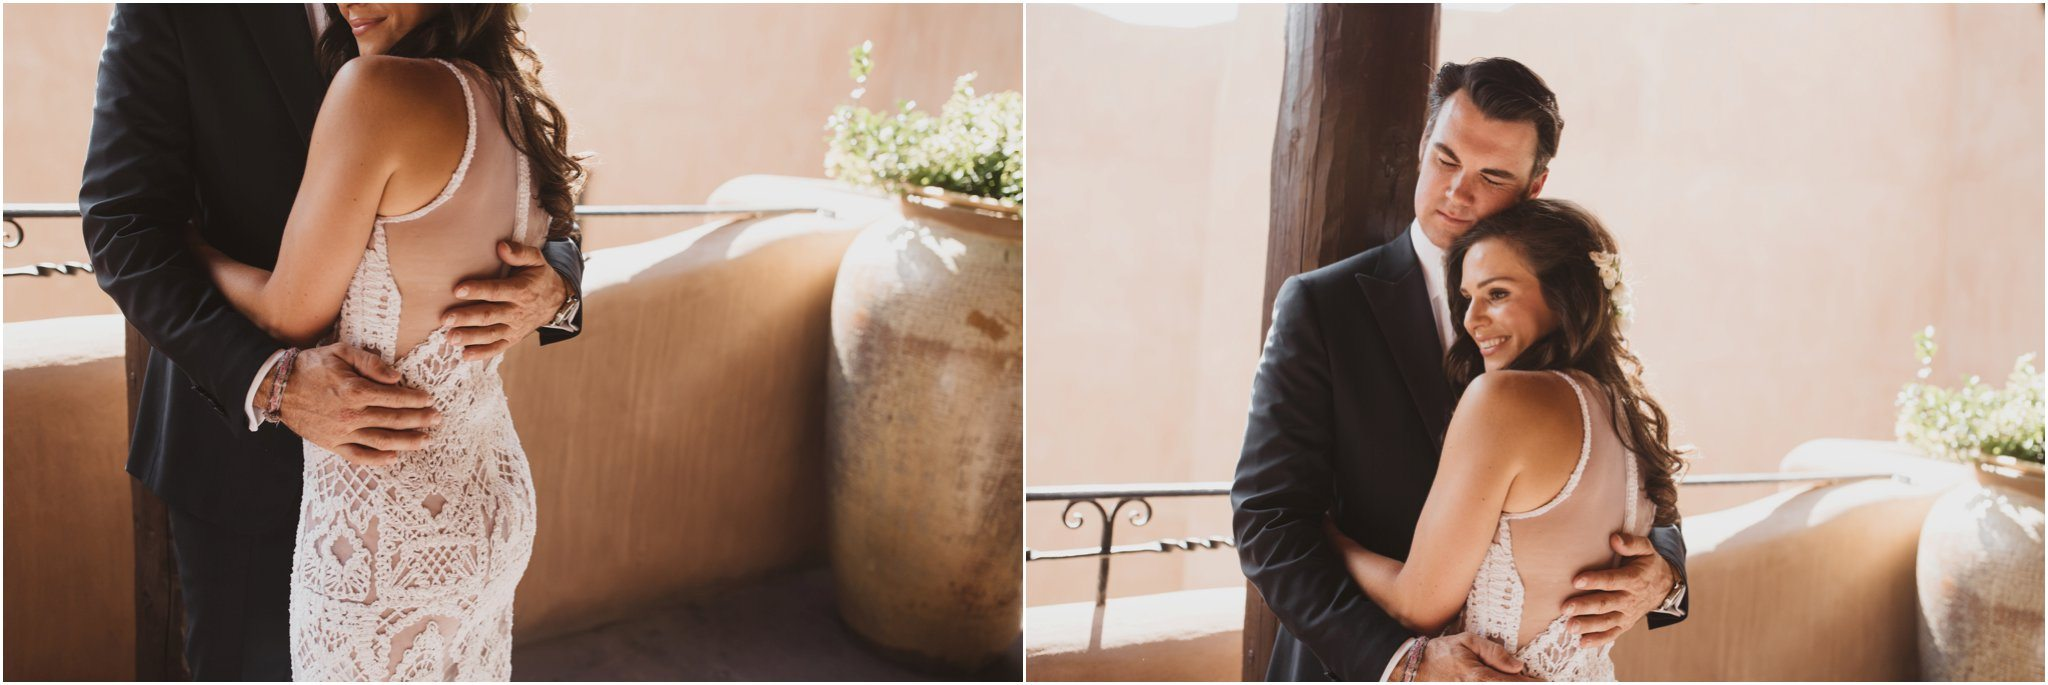 0026santa-fe-wedding-photographer_albuquerque-wedding-photographer_-southwest-wedding-photography_-blue-rose-studio